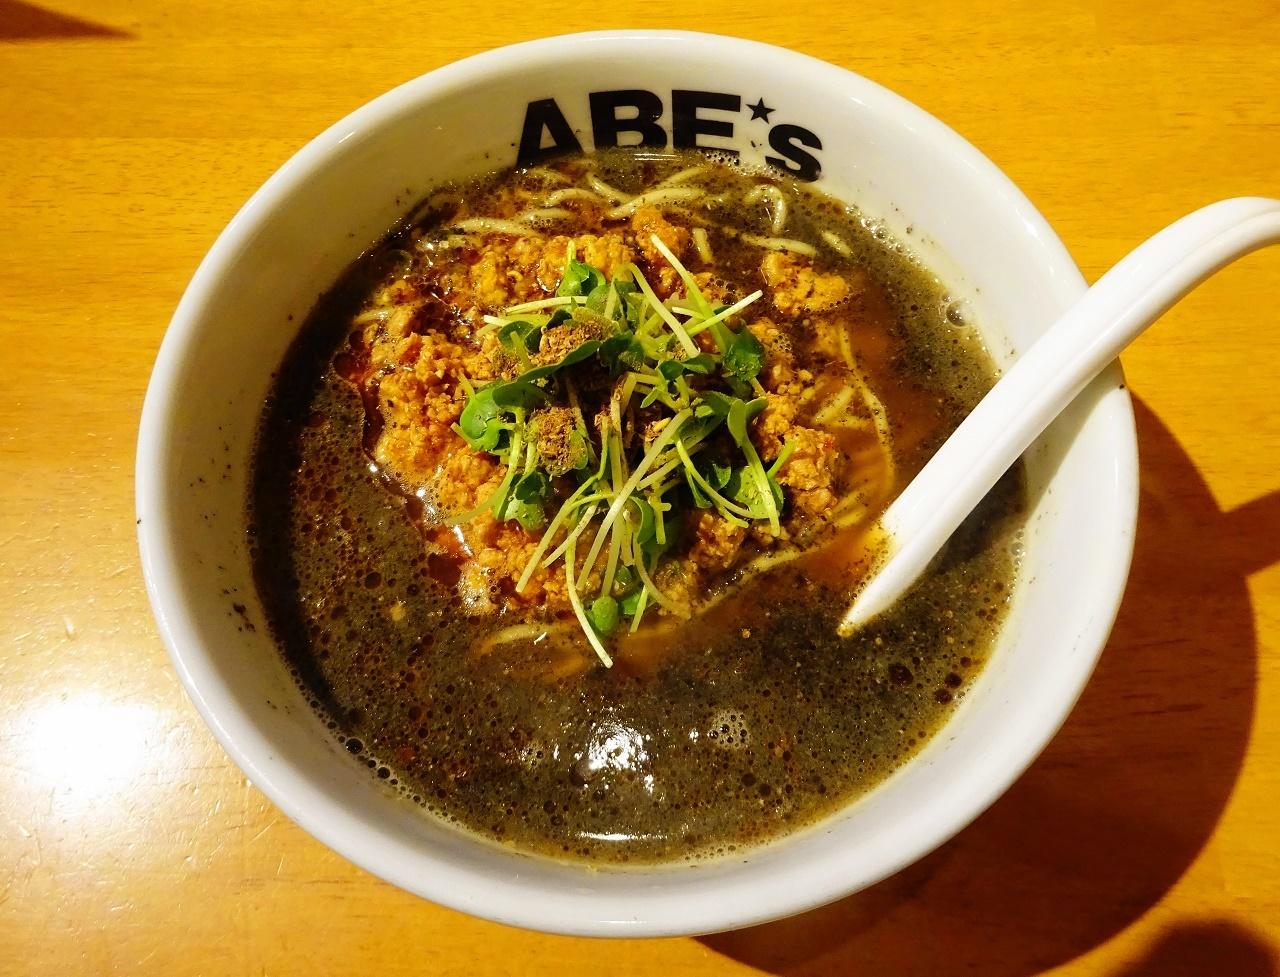 ABEs 黒胡麻担々麺